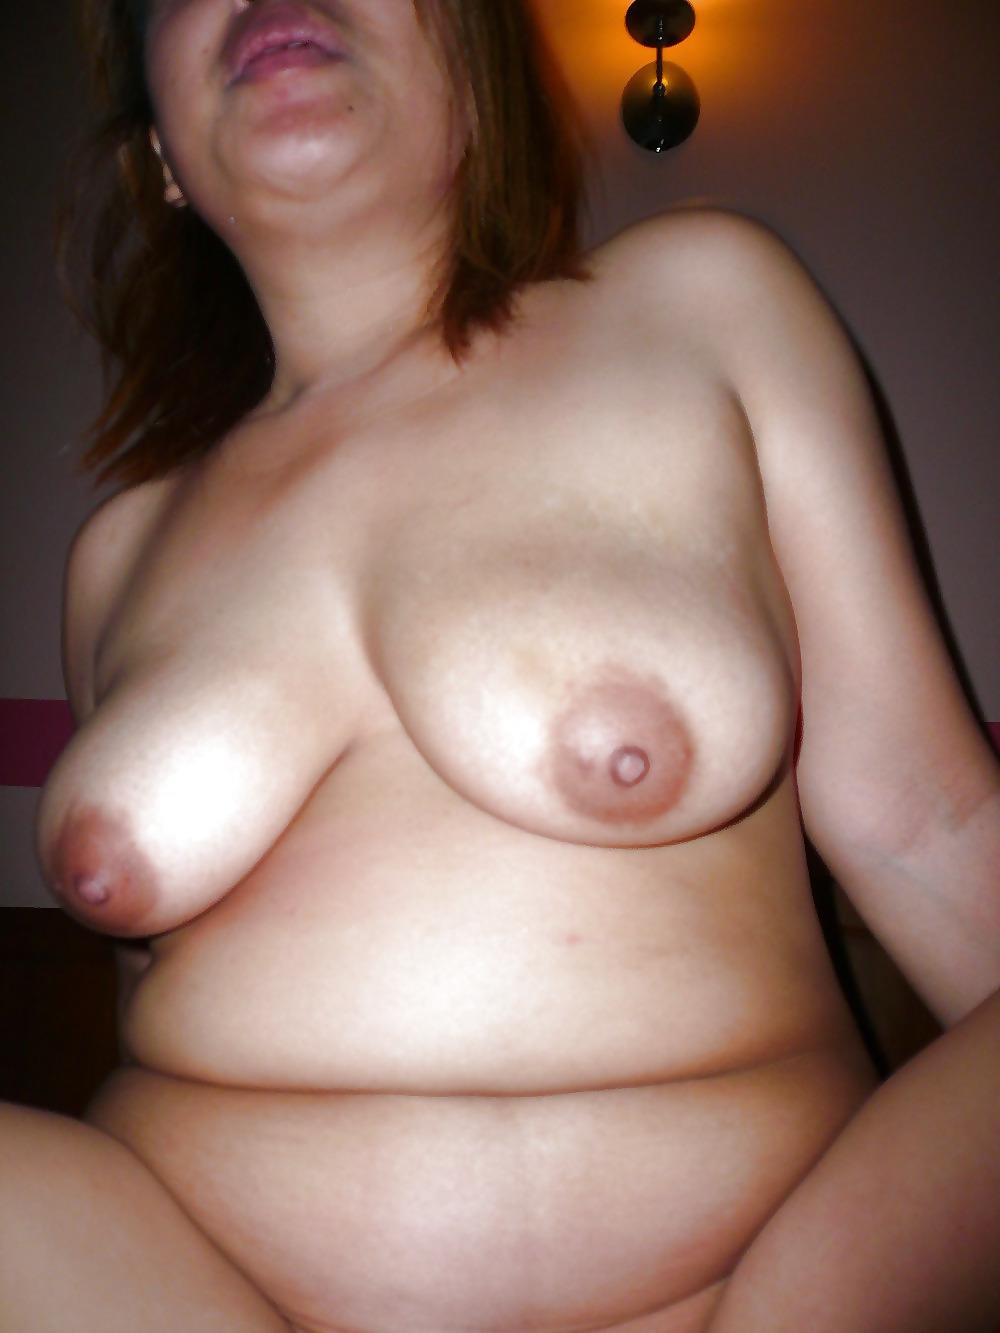 hot asians naked ready to fuck